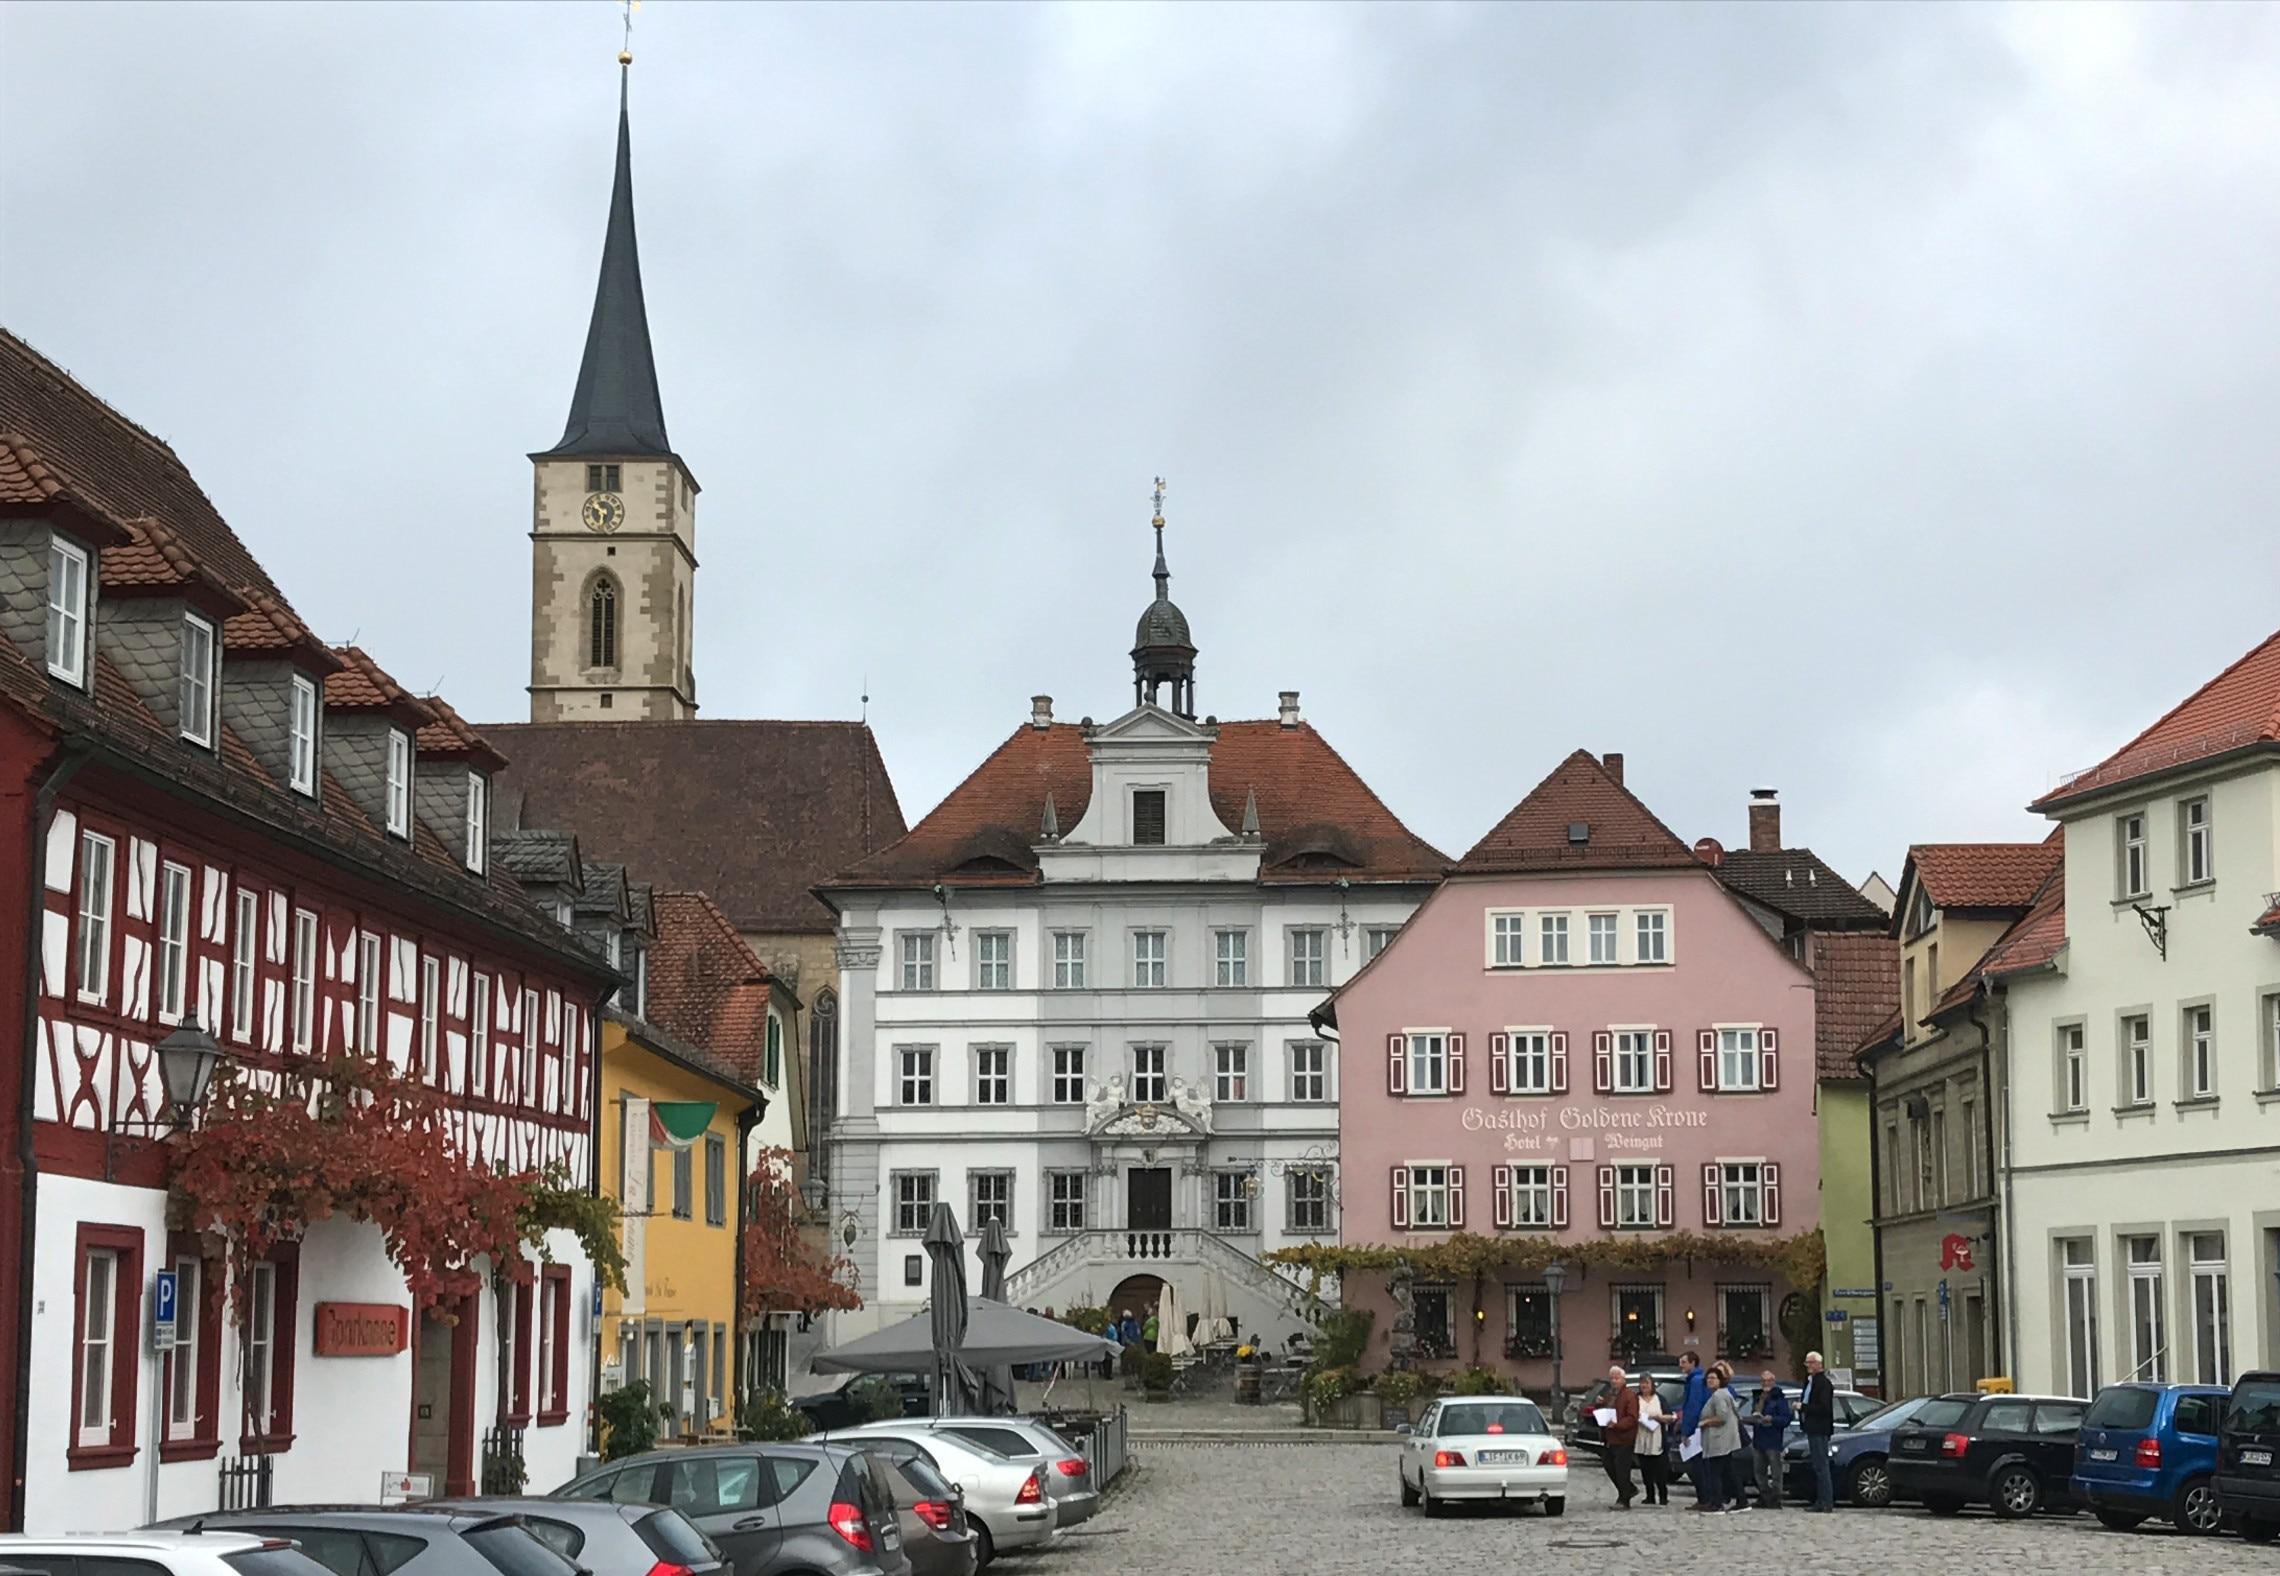 Iphofen, Beieren, Duitsland